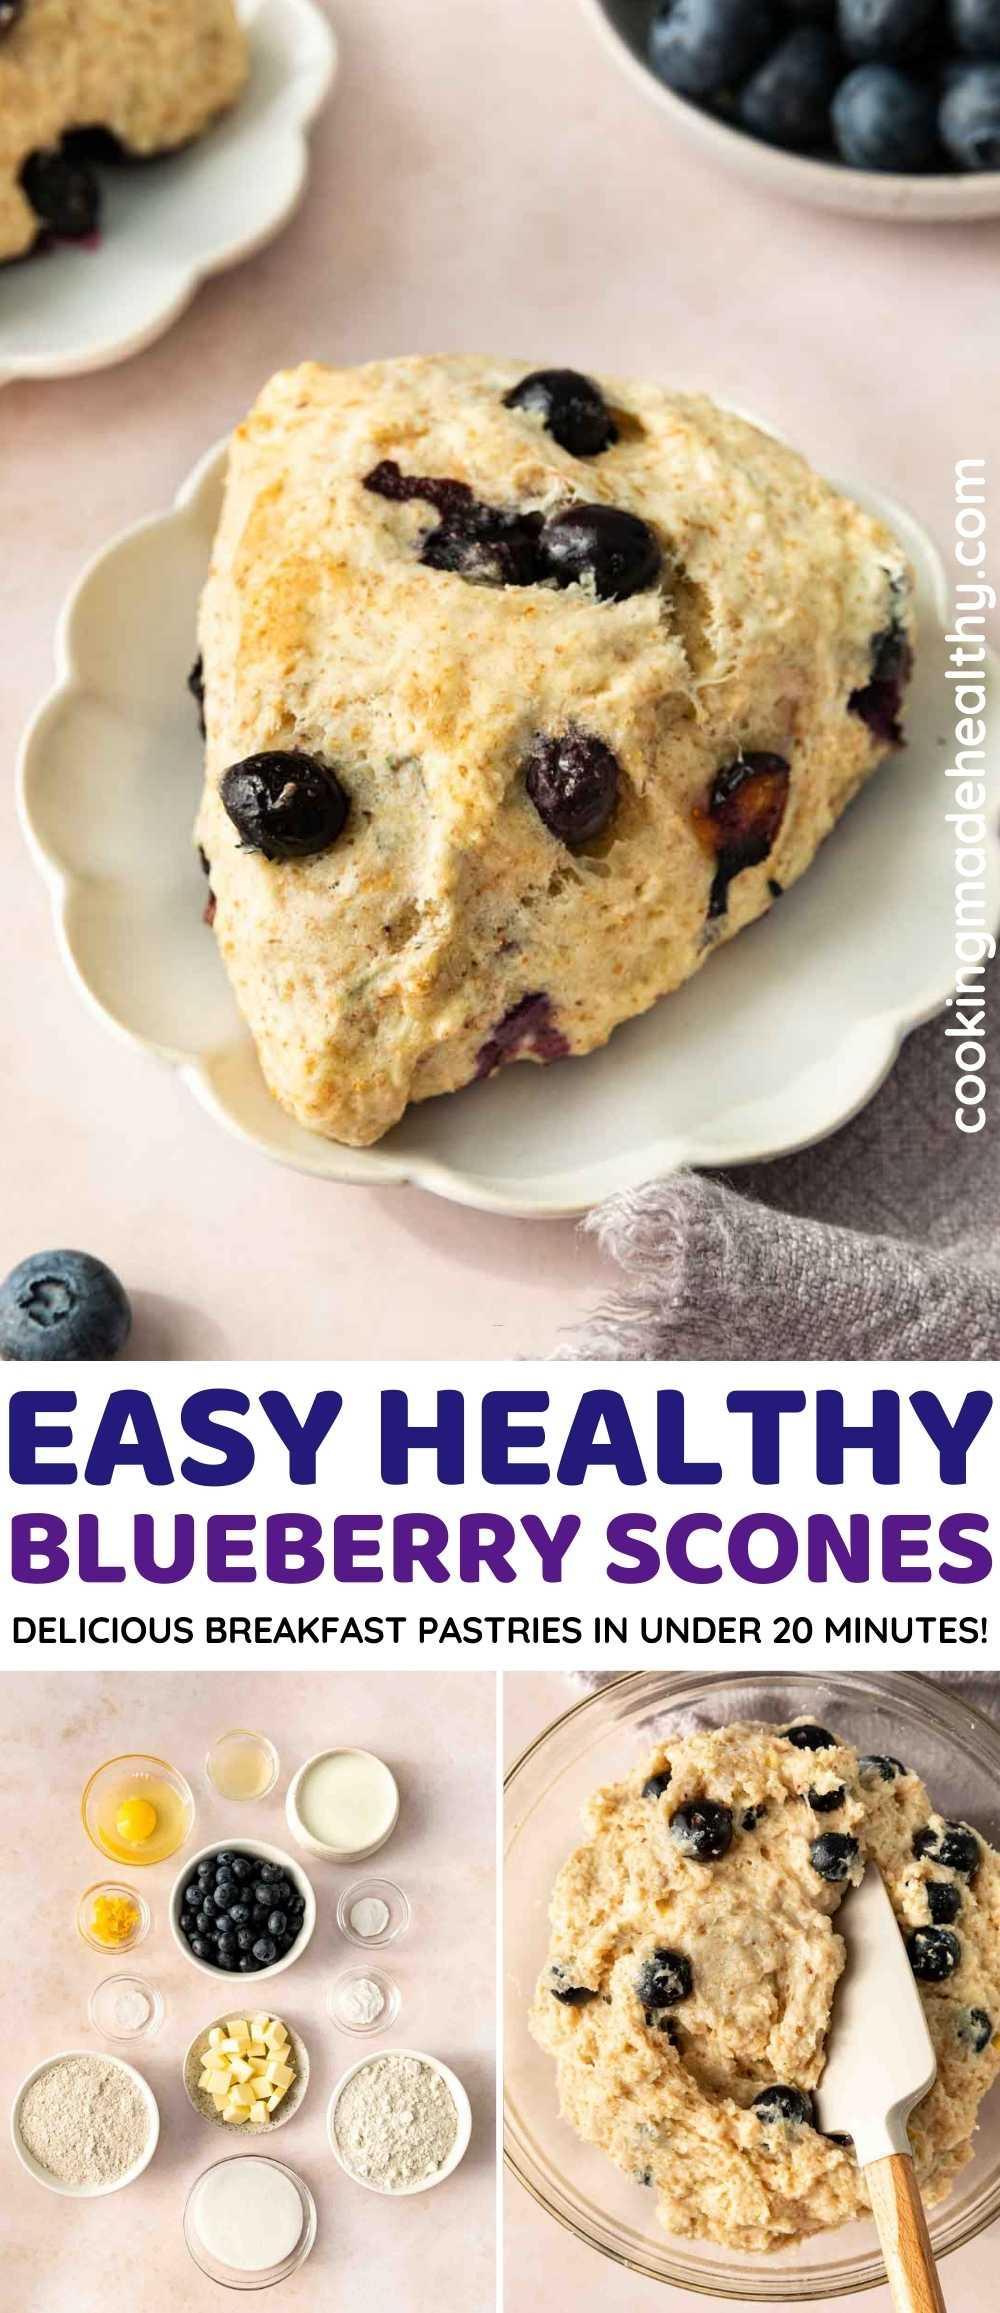 Blueberry Scones collage